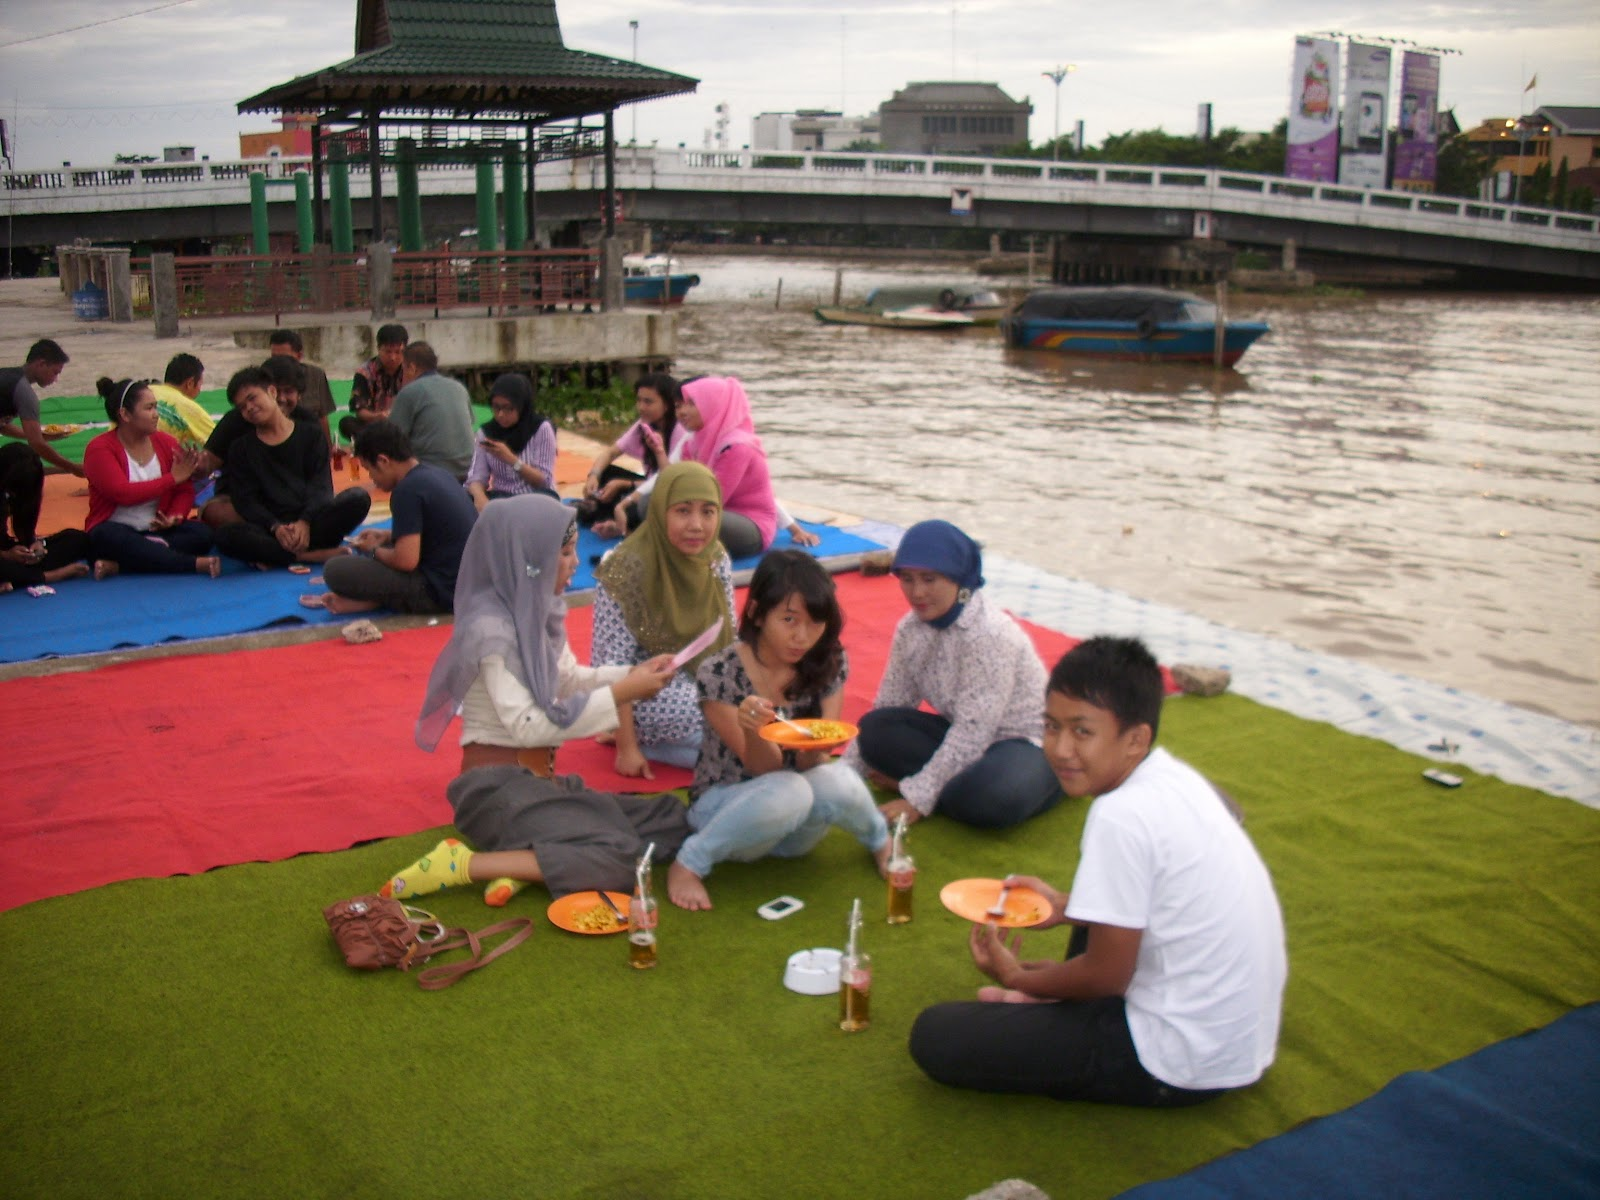 Siring Martapura Wisata Kota Banjarmasin Parigal Samsuni Identik Seribu Sungai